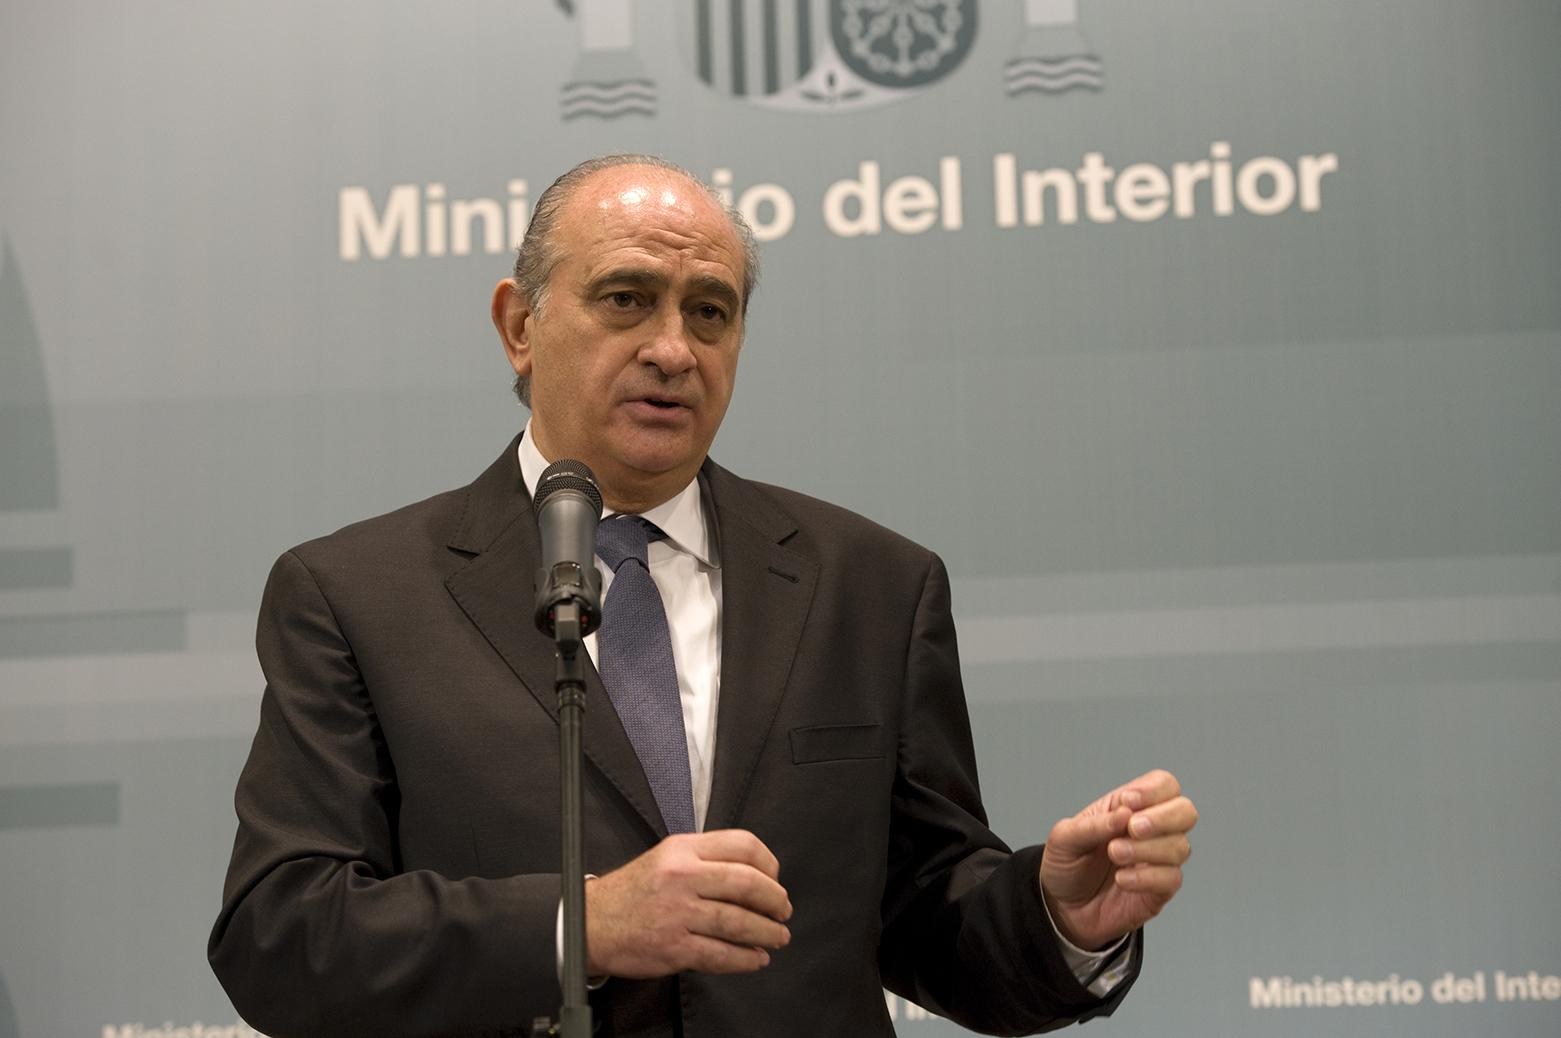 Jorge fern ndez d az ministro del interior en funciones for Ministro del interior espana 2016